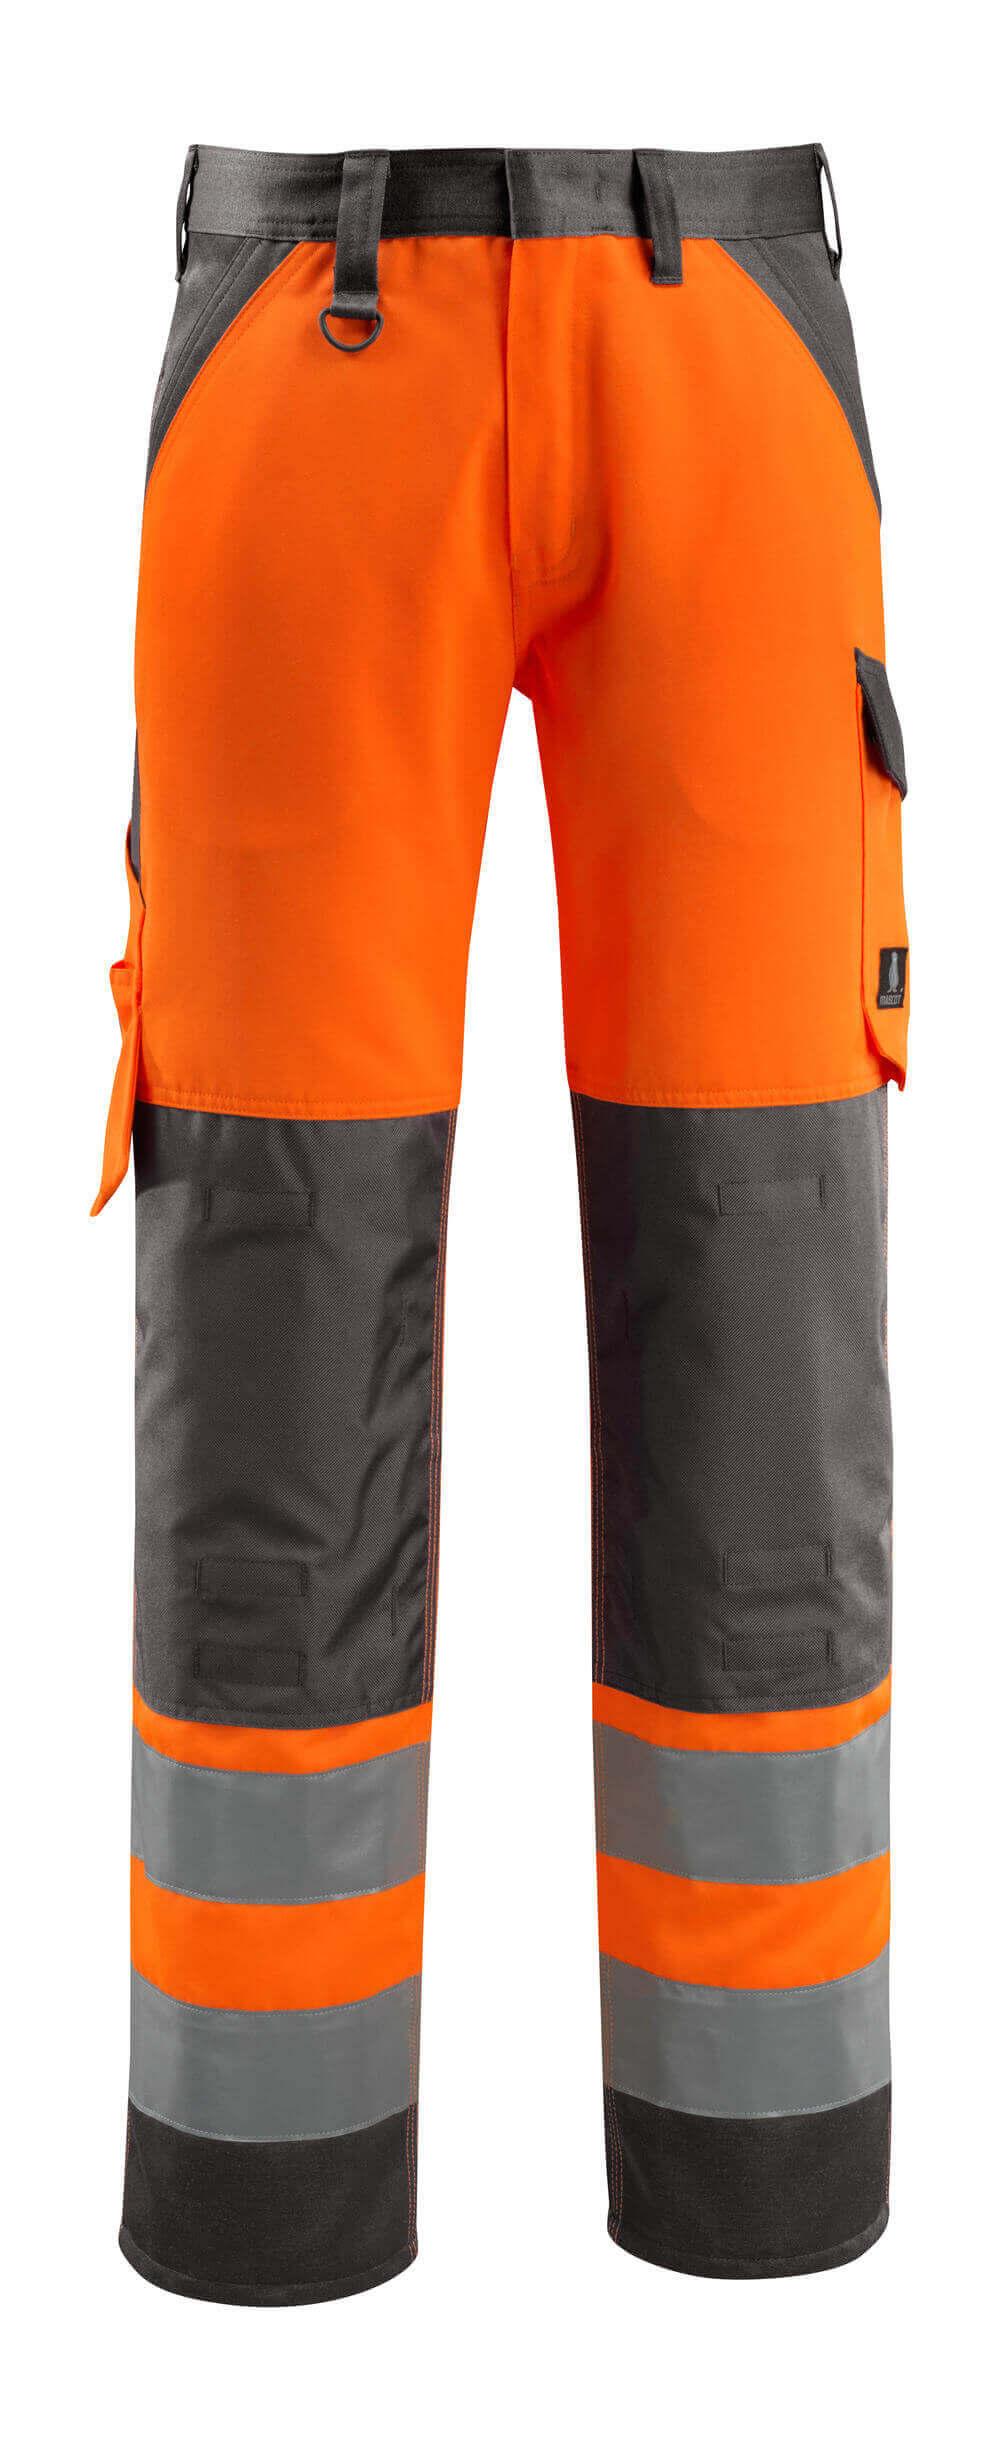 15979-948-1418 Trousers with kneepad pockets - hi-vis orange/dark anthracite